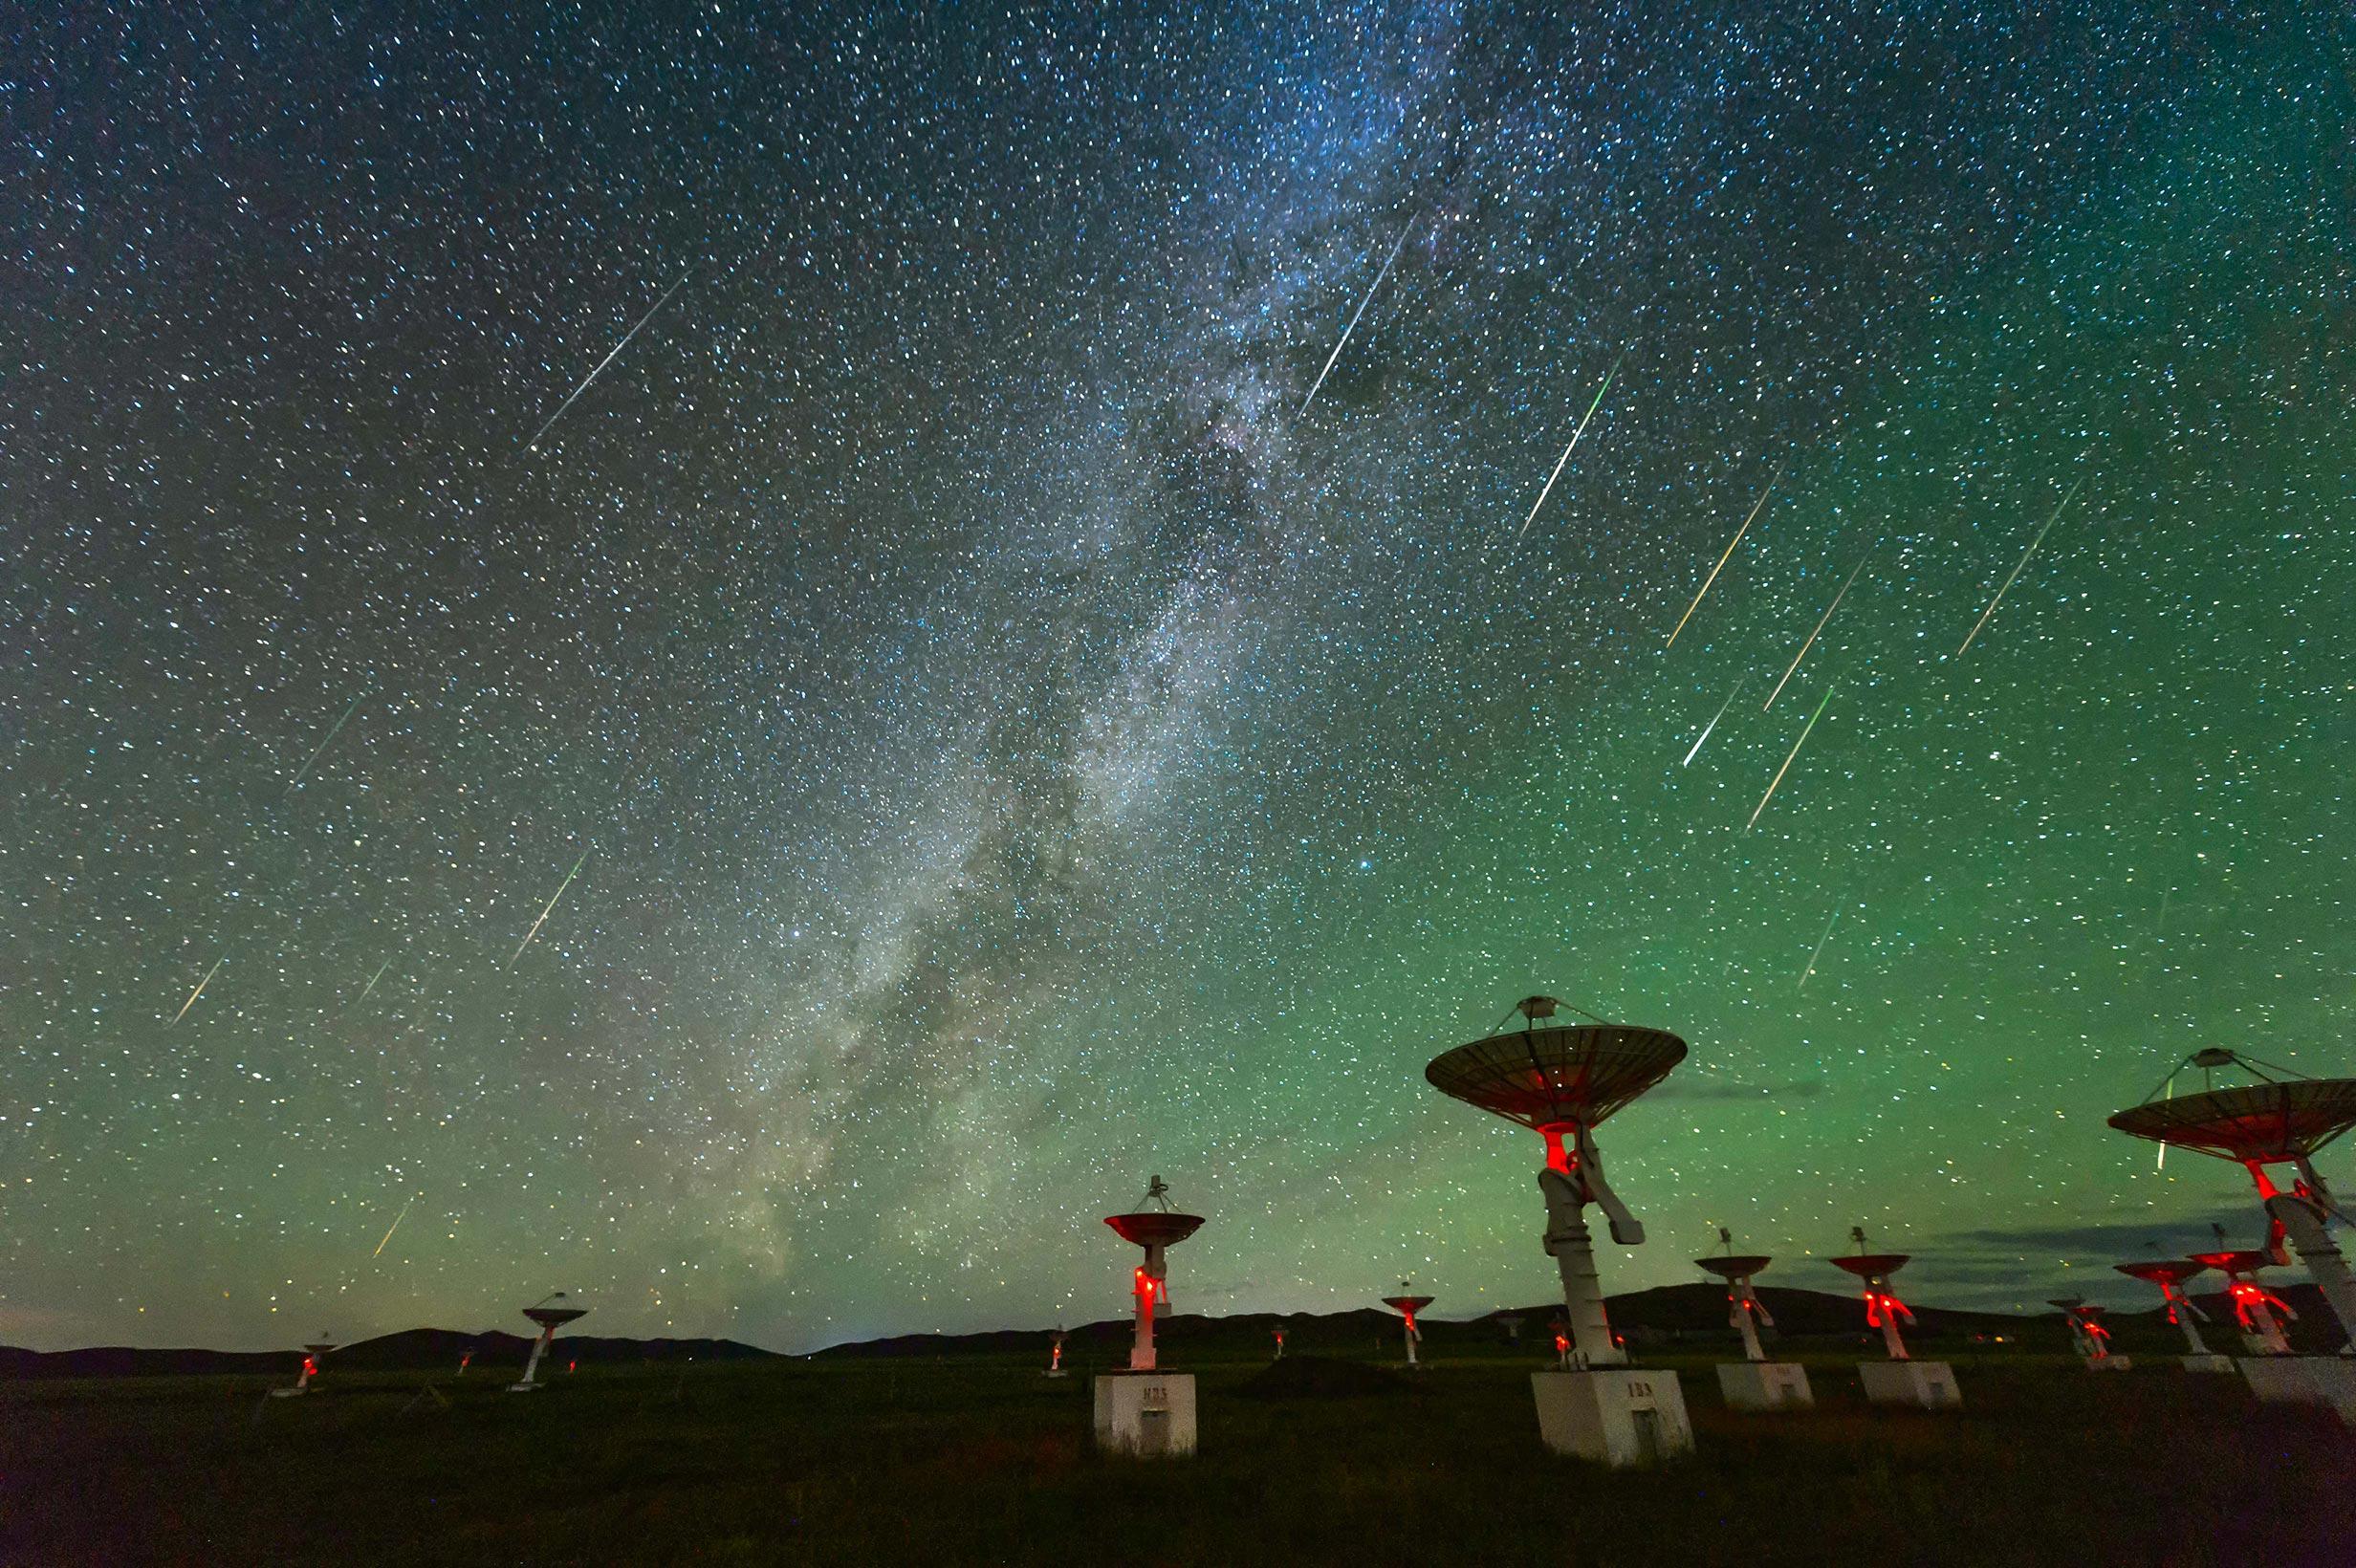 Satellites-radio waves-Milky Way-Contact-